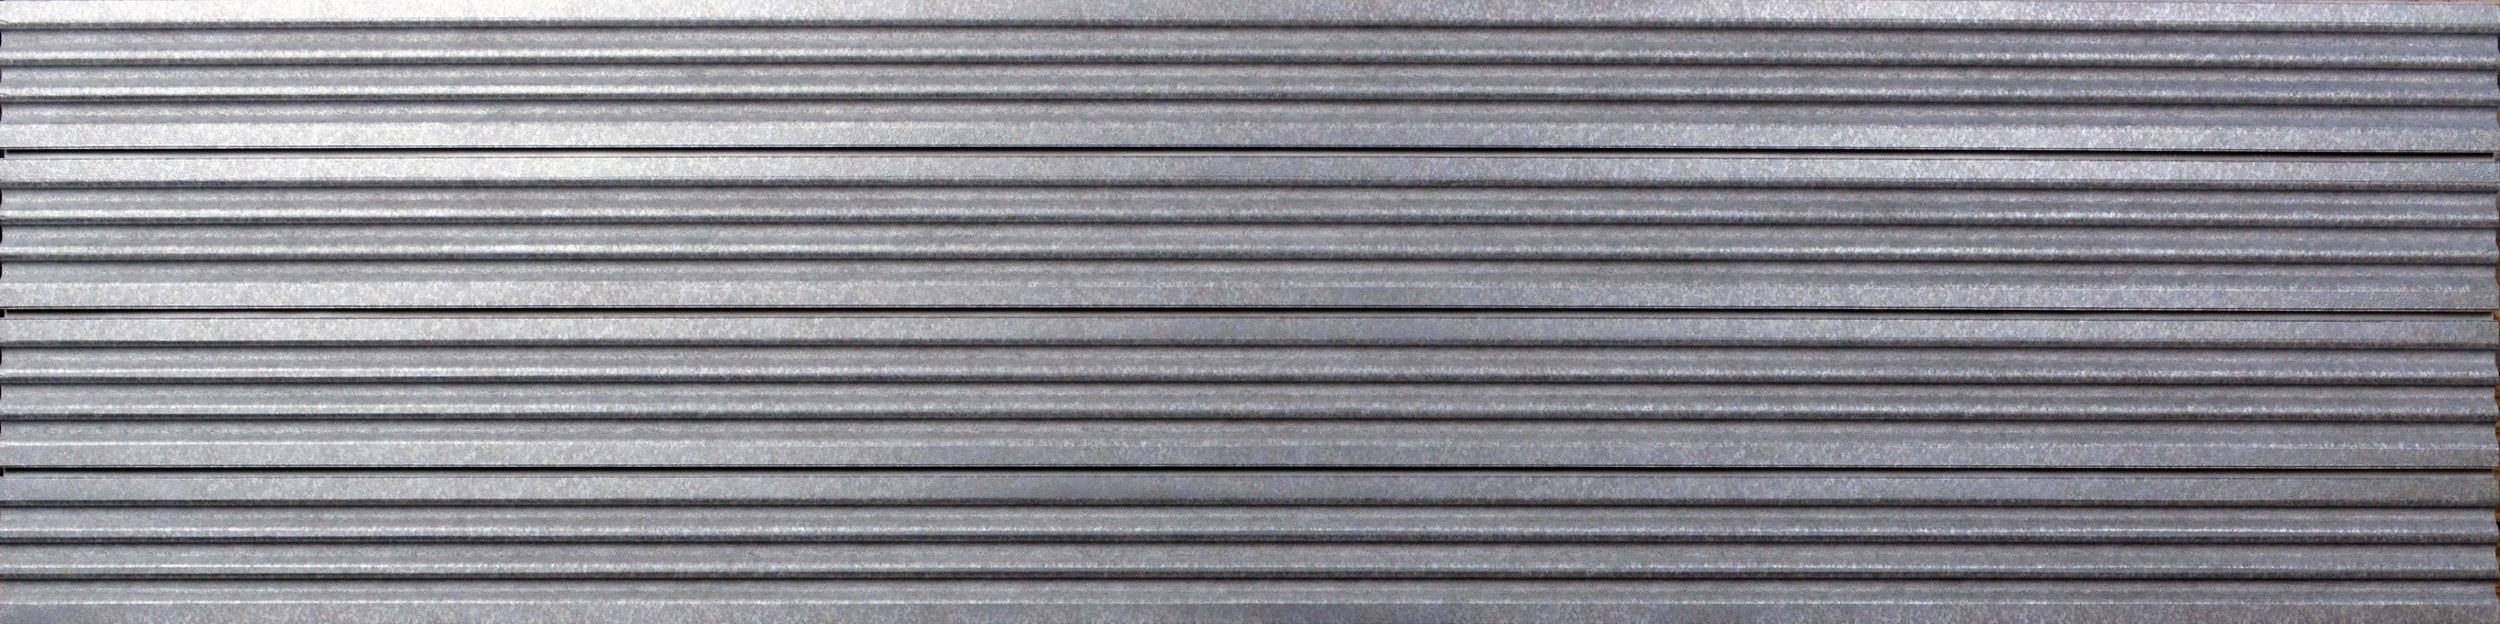 Corrugated galvanized 10 inx350 dpi.jpg